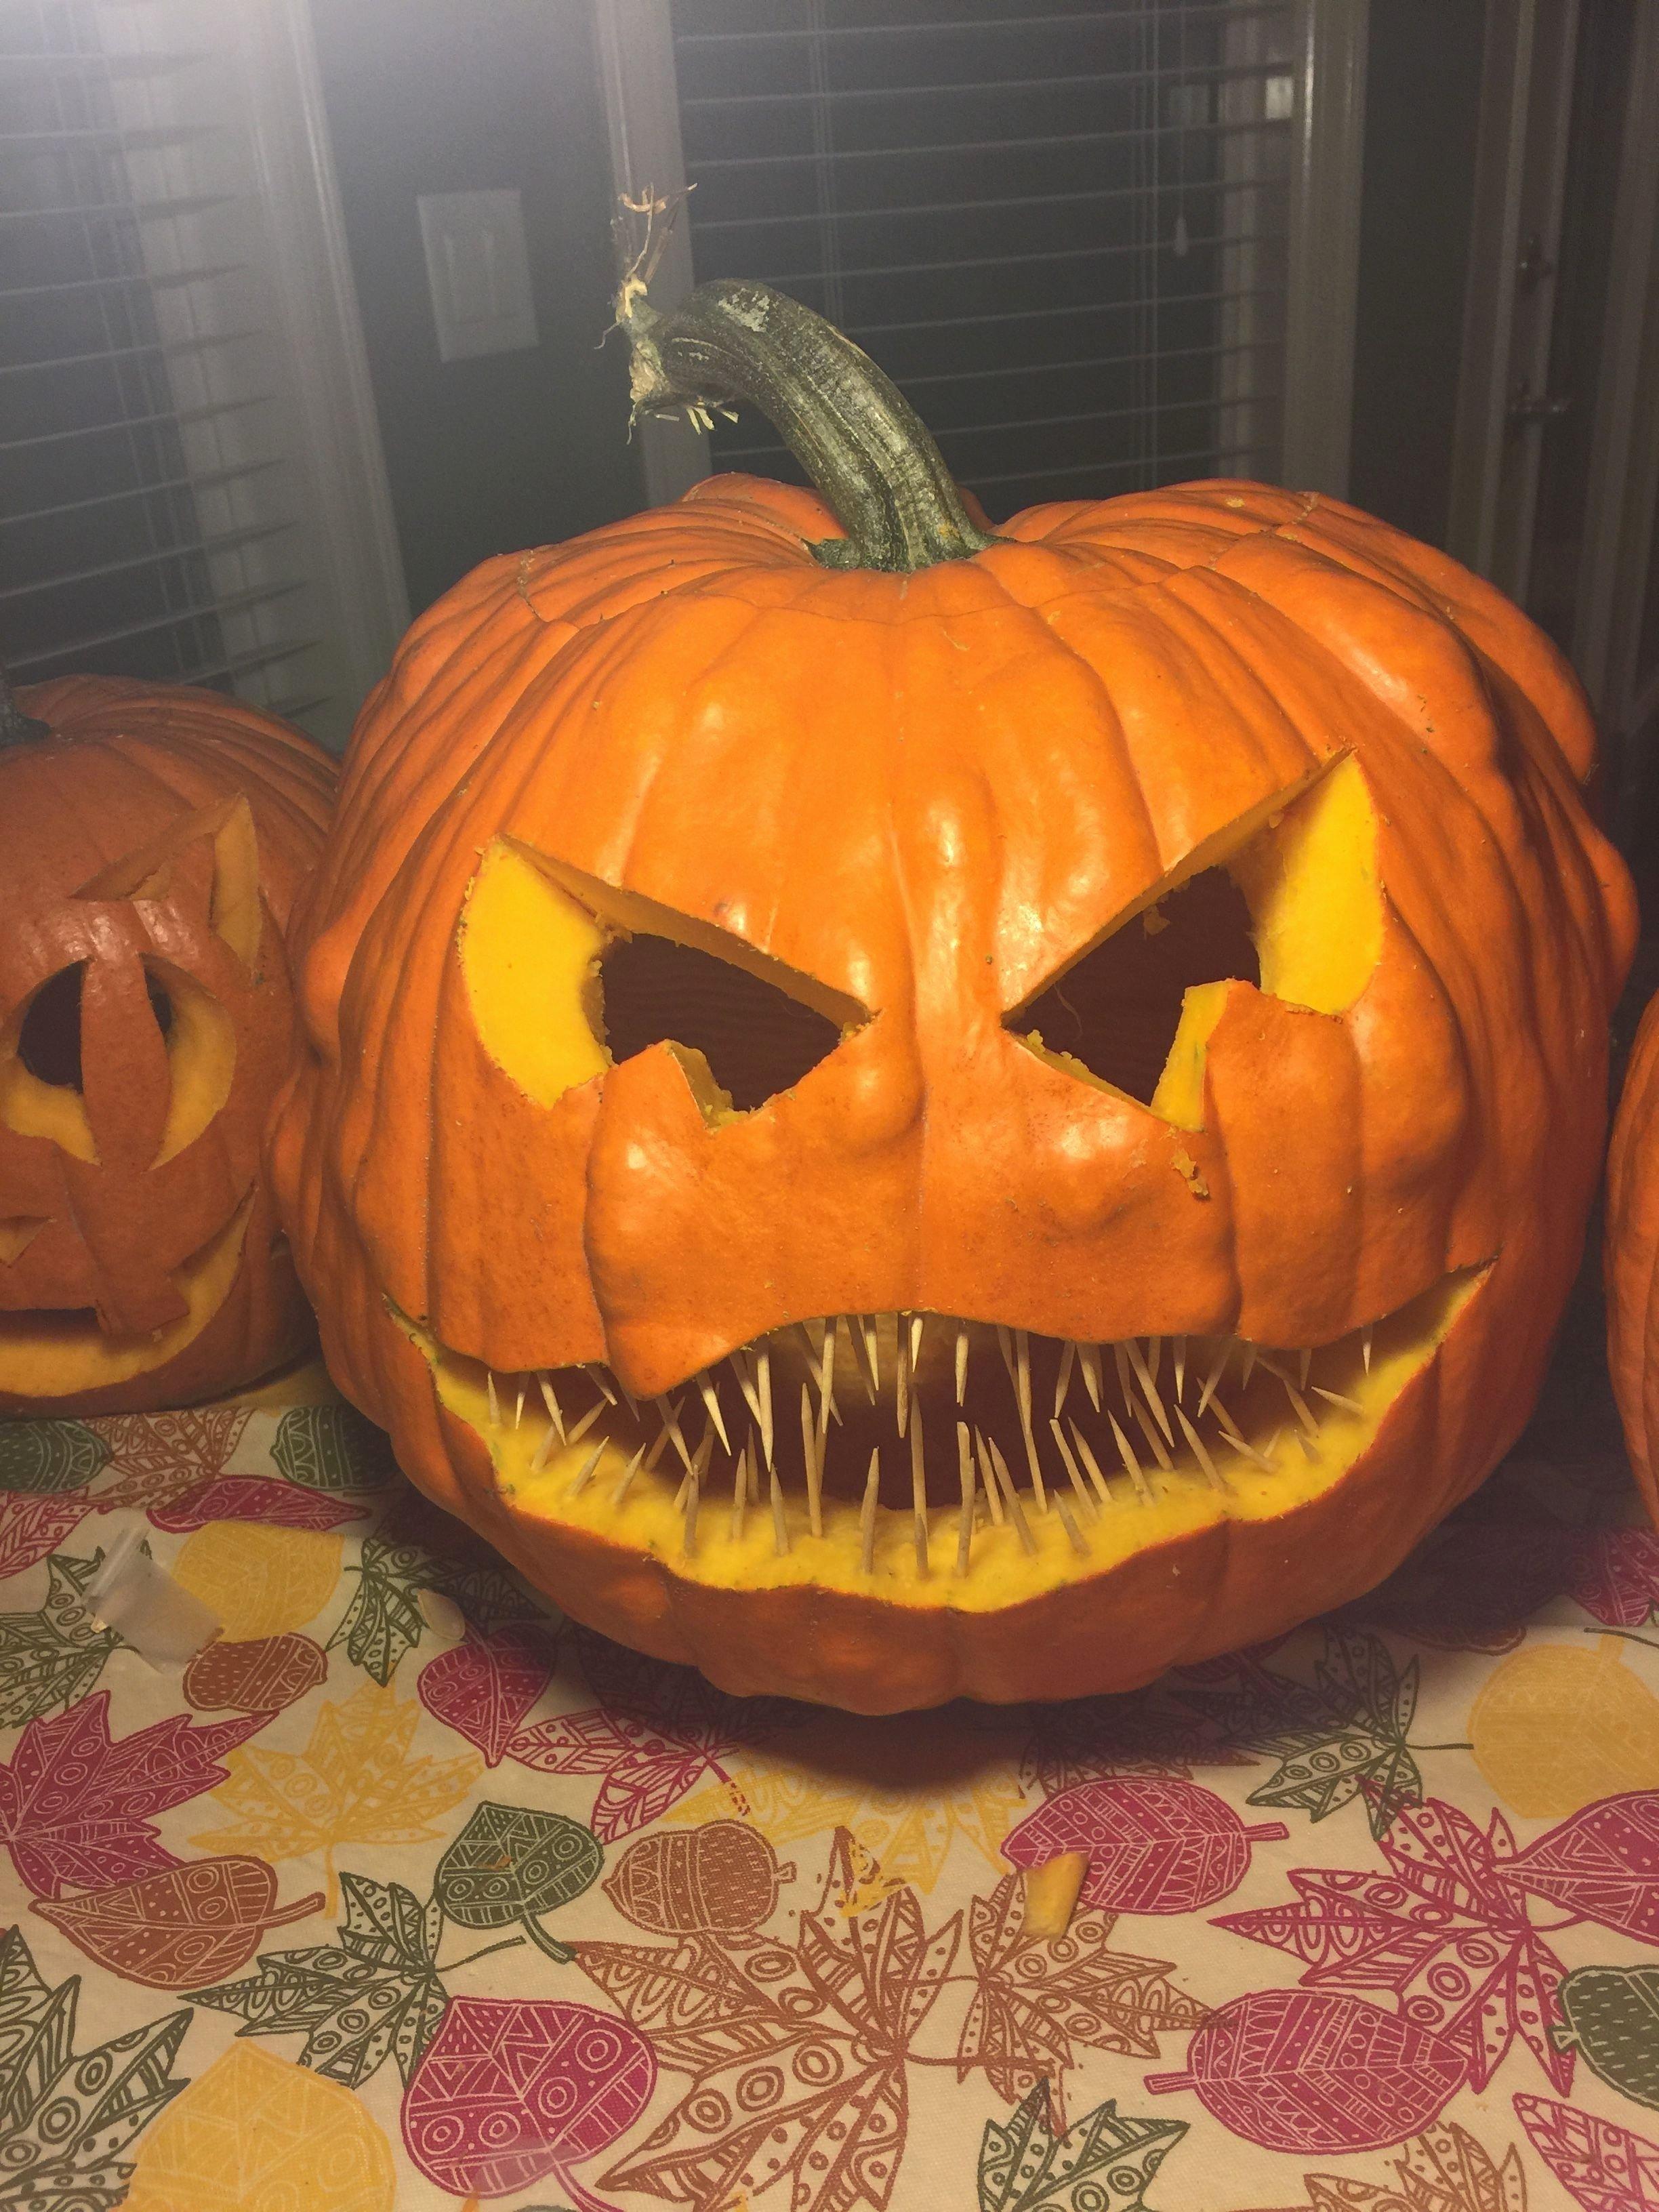 10 Stylish Creative Jack O Lantern Ideas pumpkin jack o lantern patterns fresh easy pumpkin carving idea with 2020